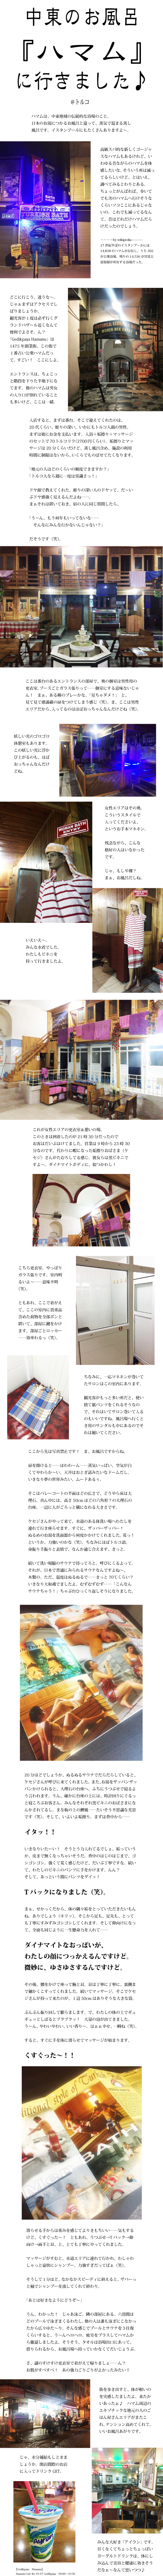 tomako160224.jpg